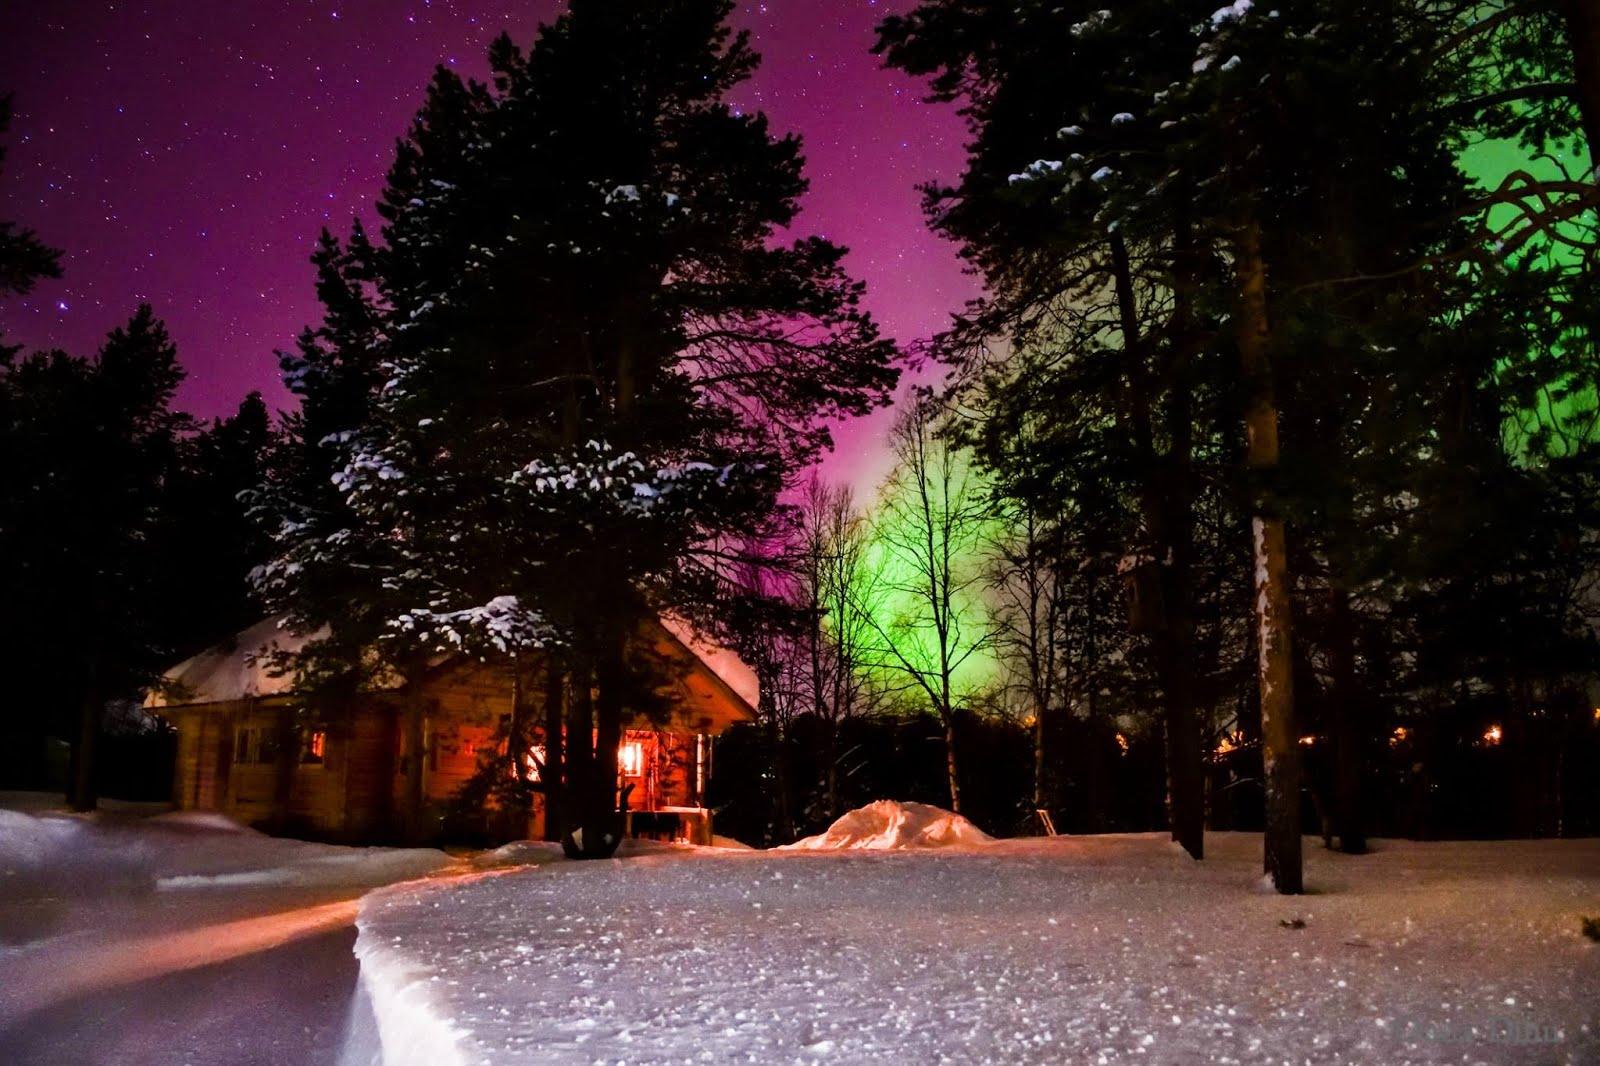 Enontekiö Lapland 2017